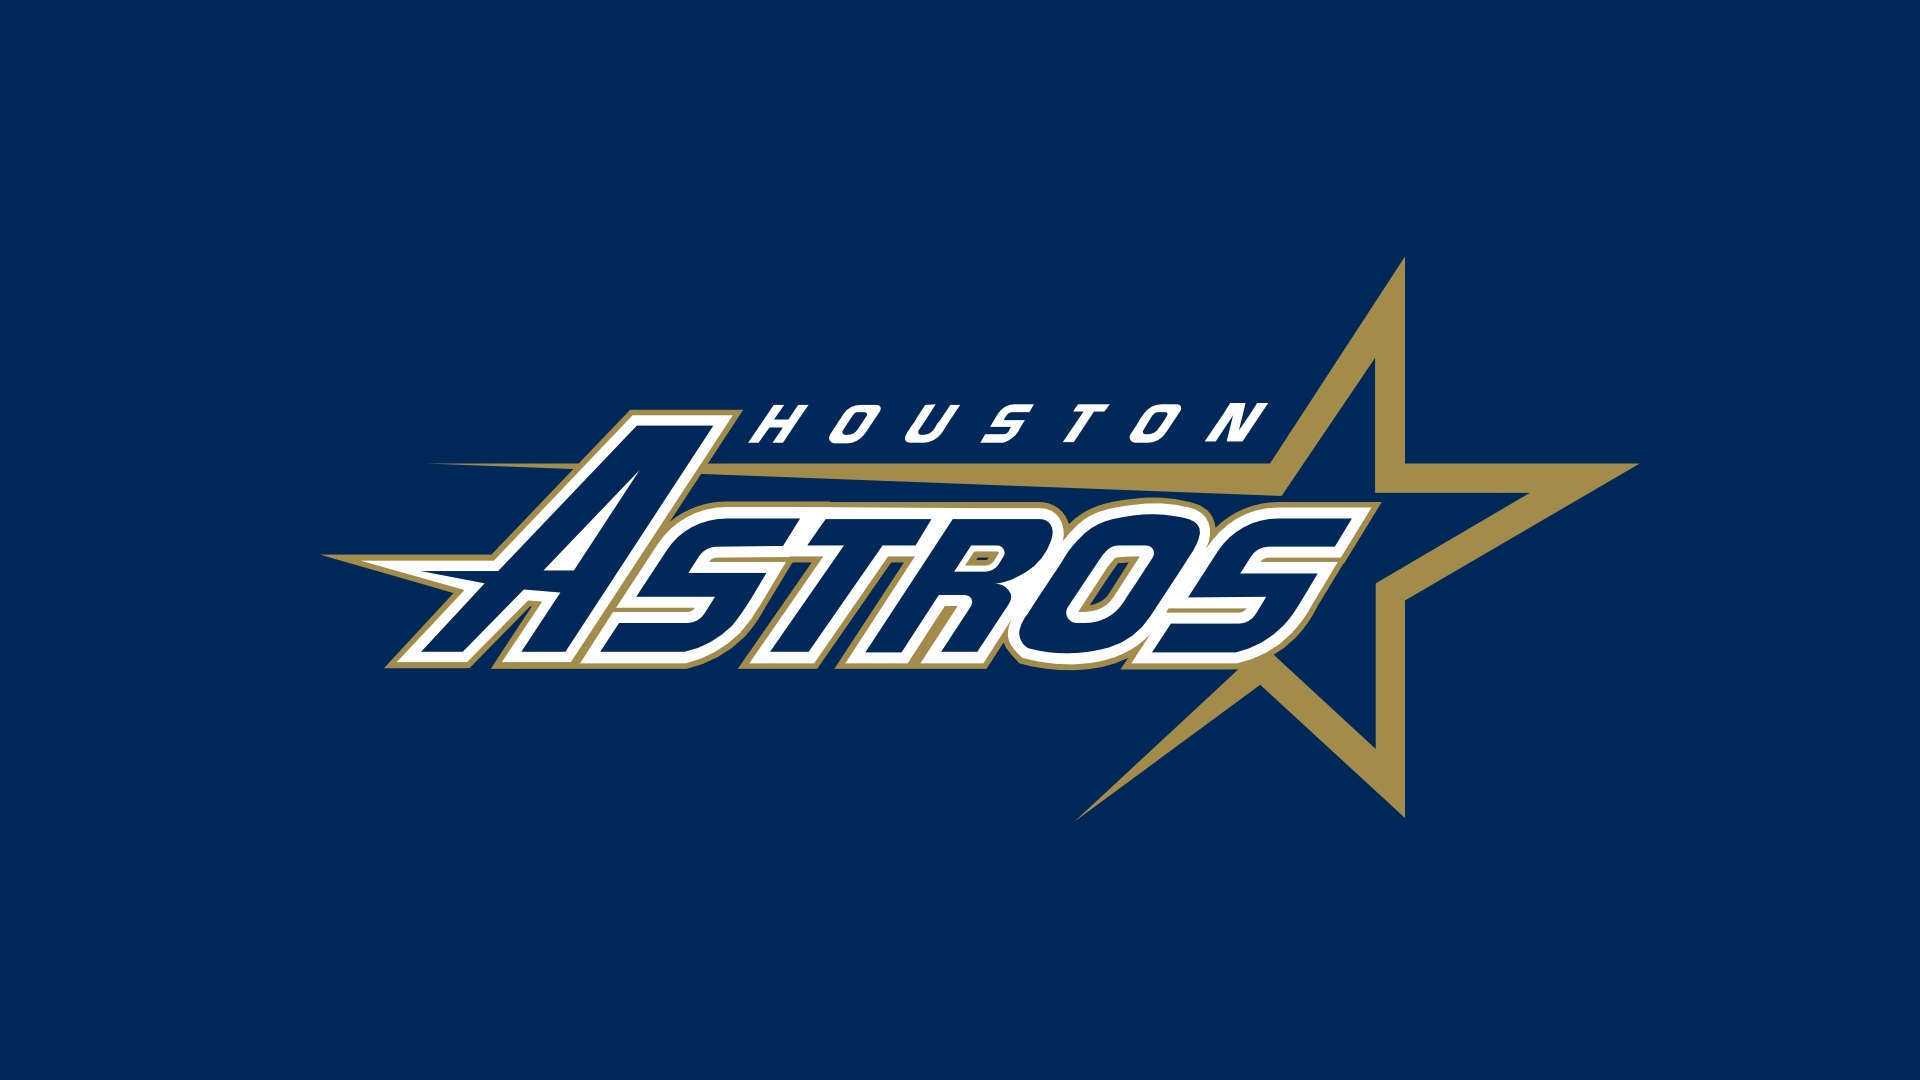 Hd wallpaper upload - Wallpaper Houston Astros Logo Hd Wallpaper Upload At April 27 2014